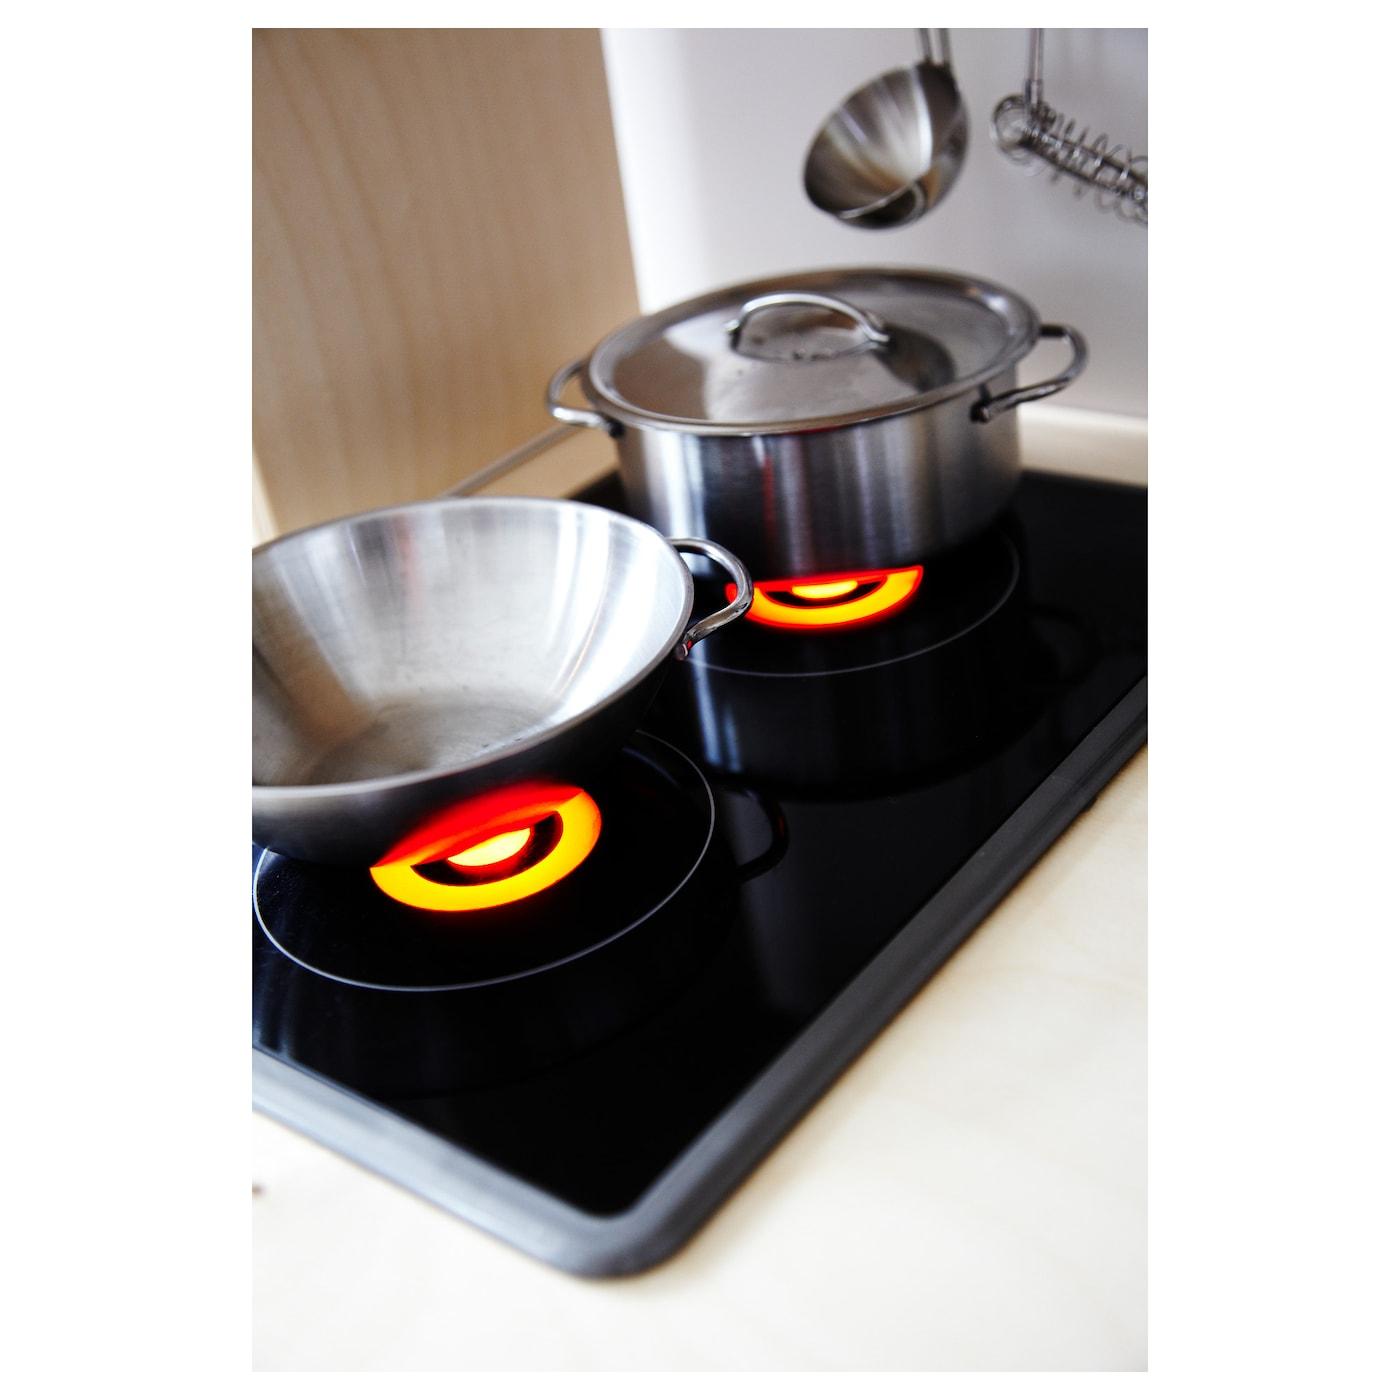 duktig 5 piece cookware set stainless steel colour ikea. Black Bedroom Furniture Sets. Home Design Ideas